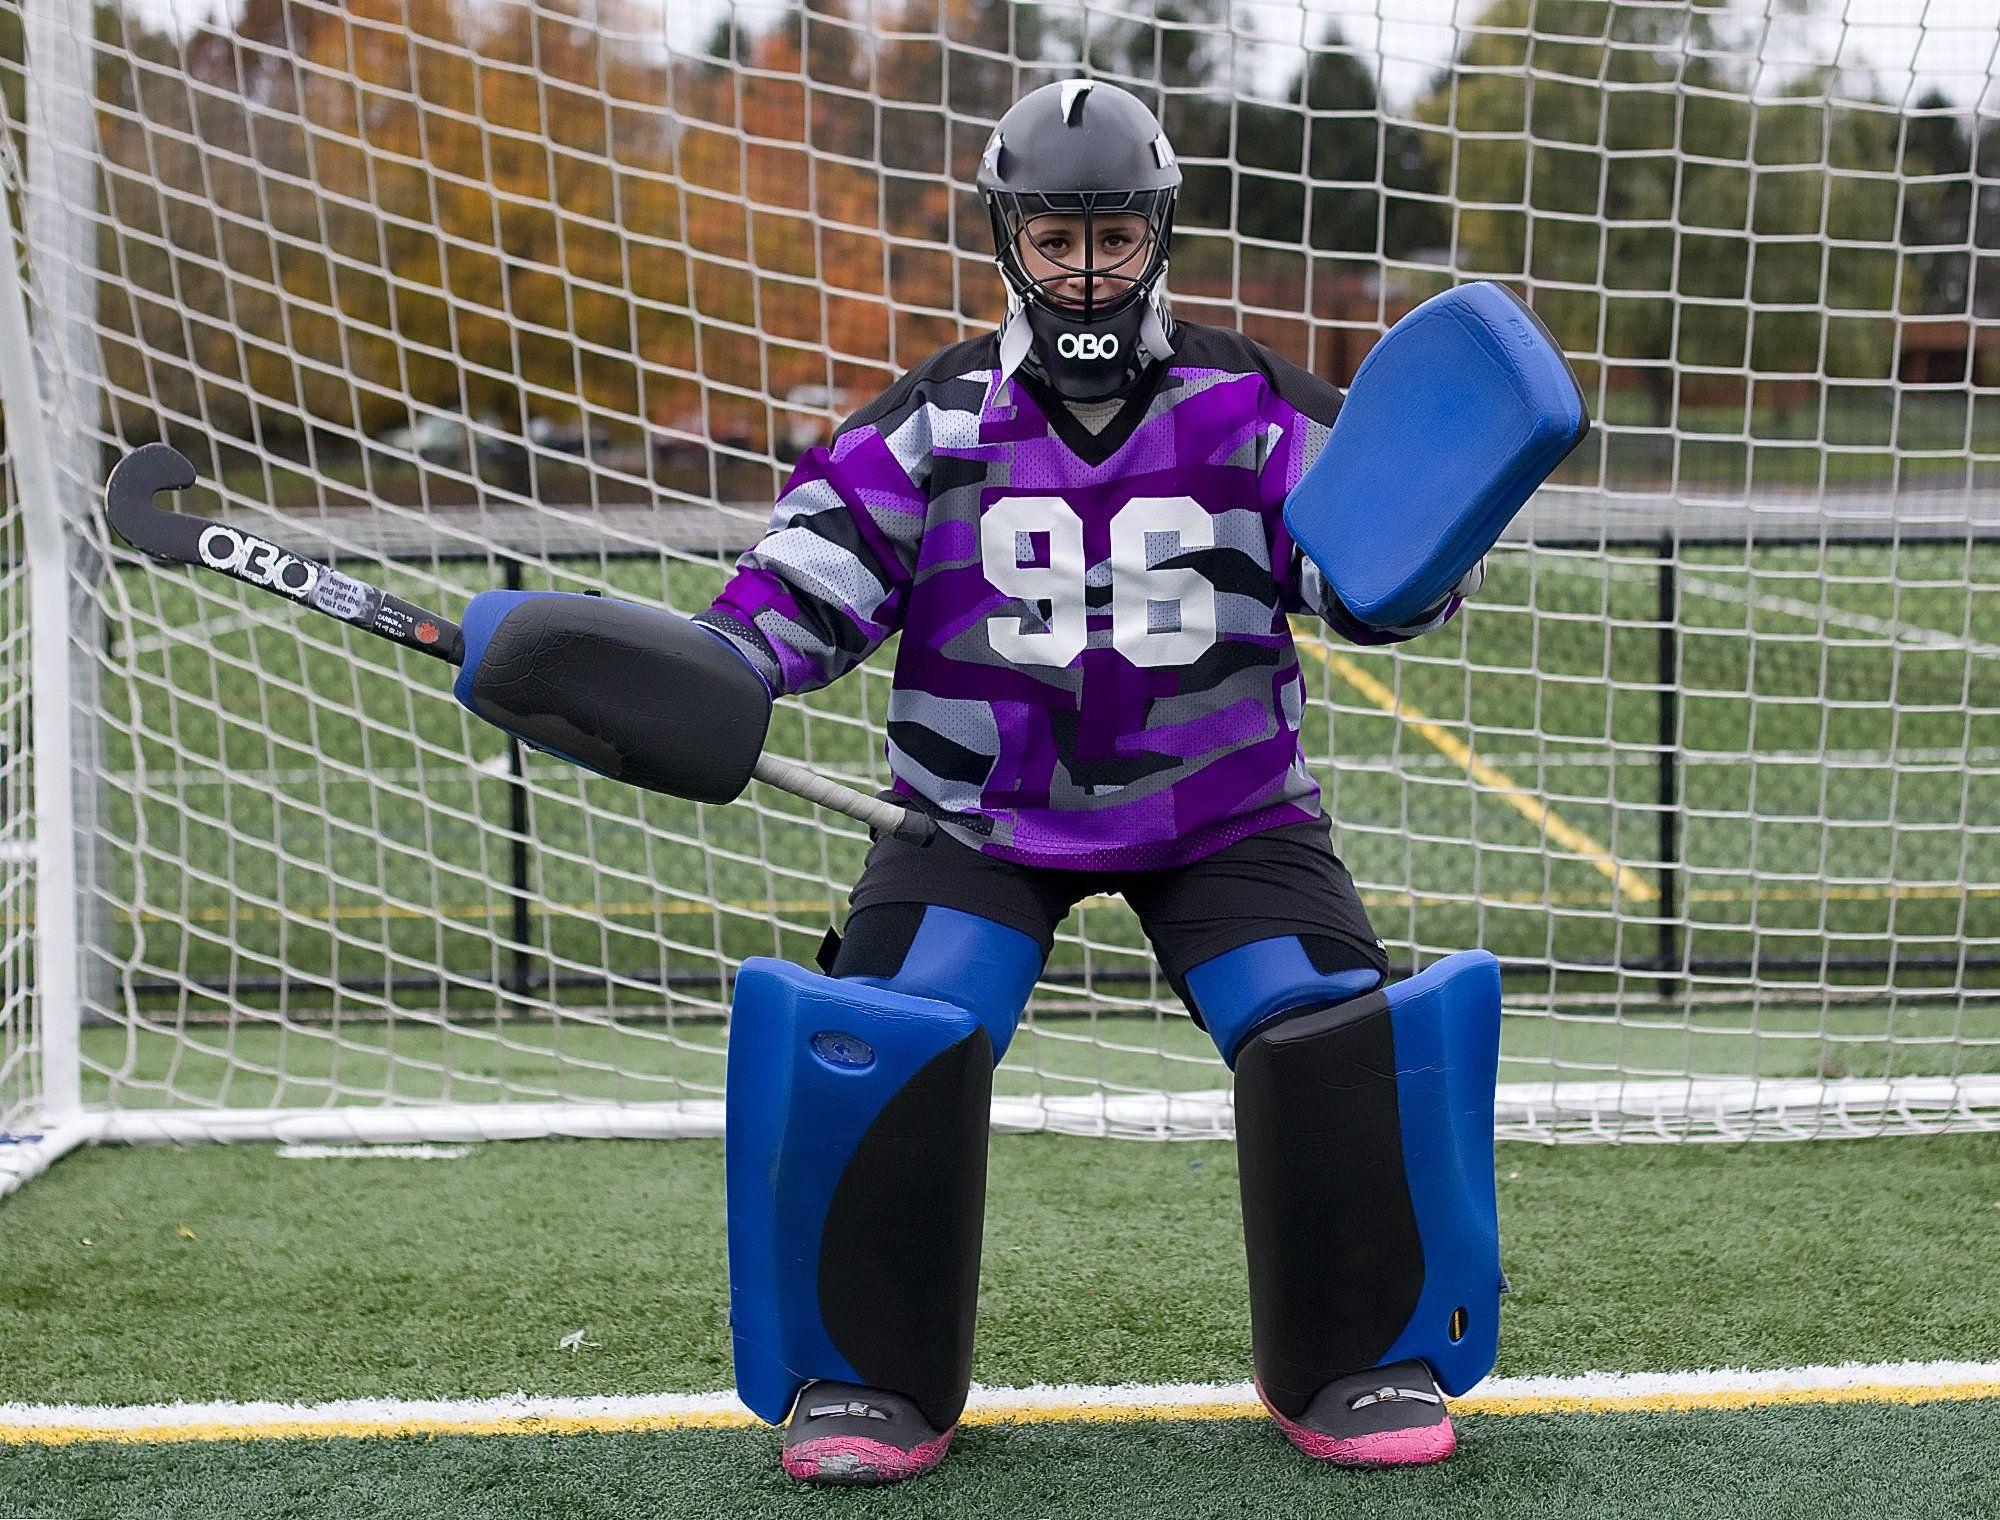 Love that Field hockey girl rival